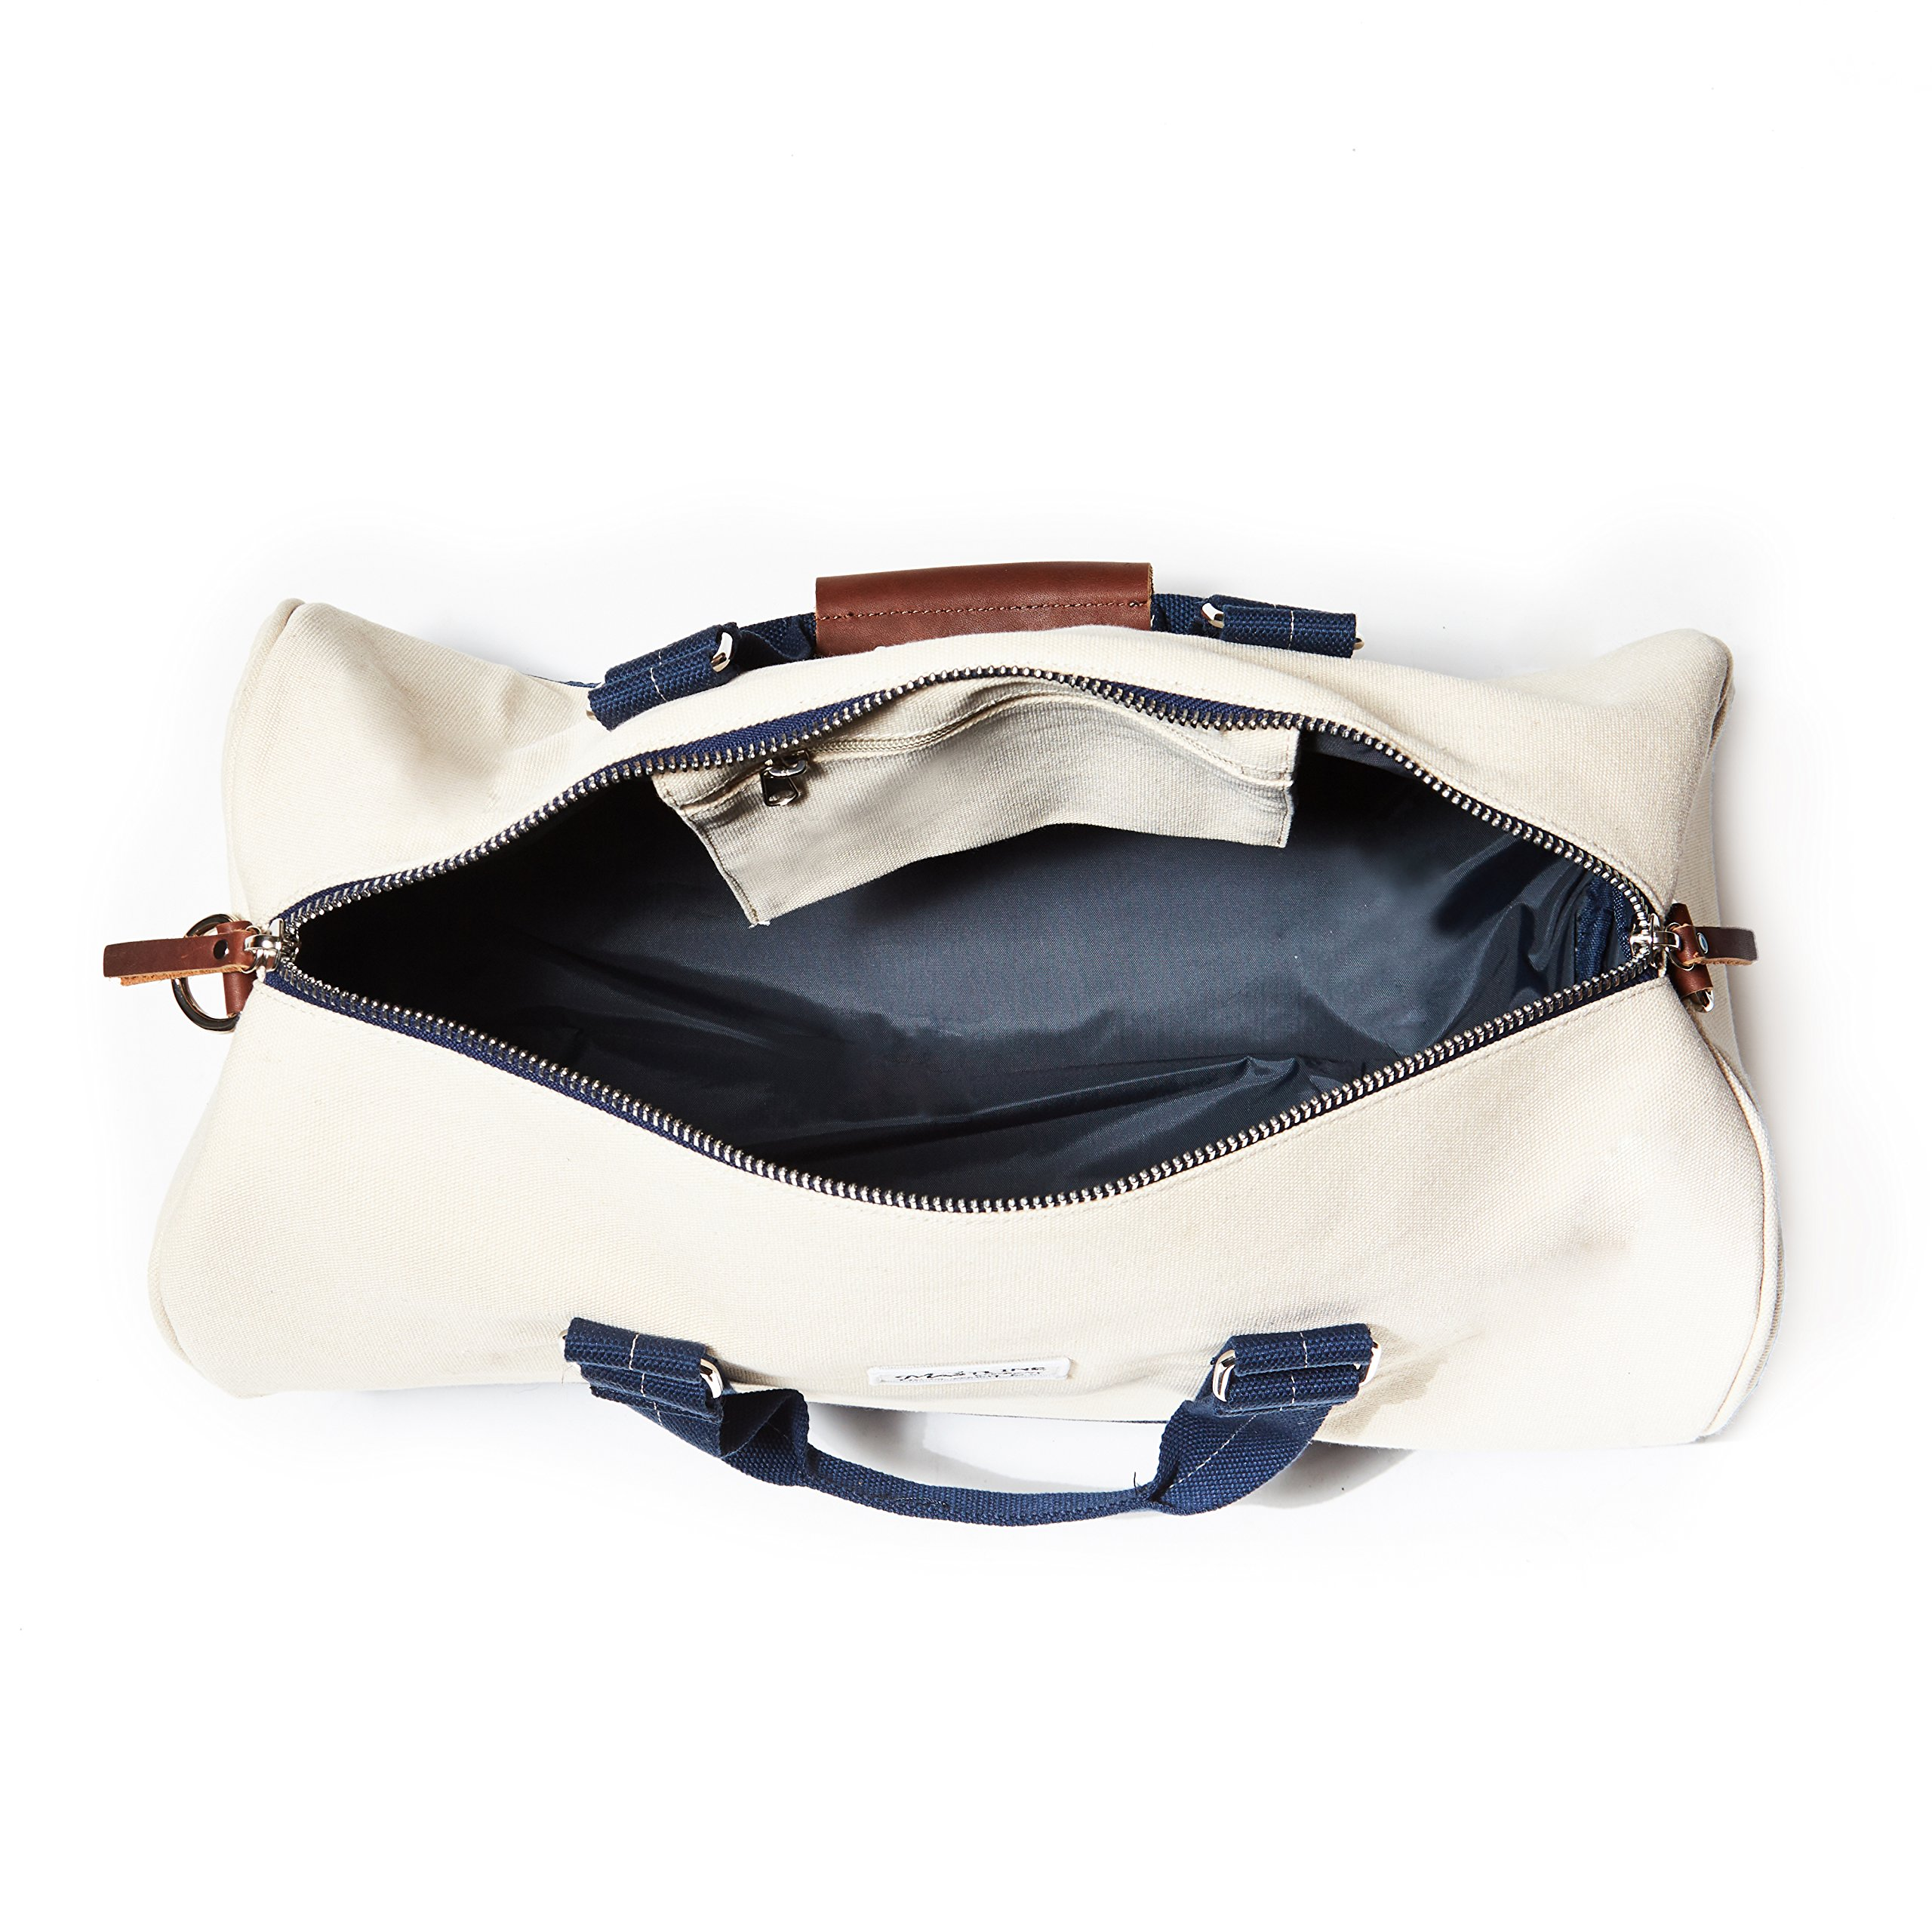 THE MASTLINE Co. | Hudson Barrel Duffel Travel Bag | Canvas & Leather (Natural White) by THE MASTLINE Co. (Image #2)